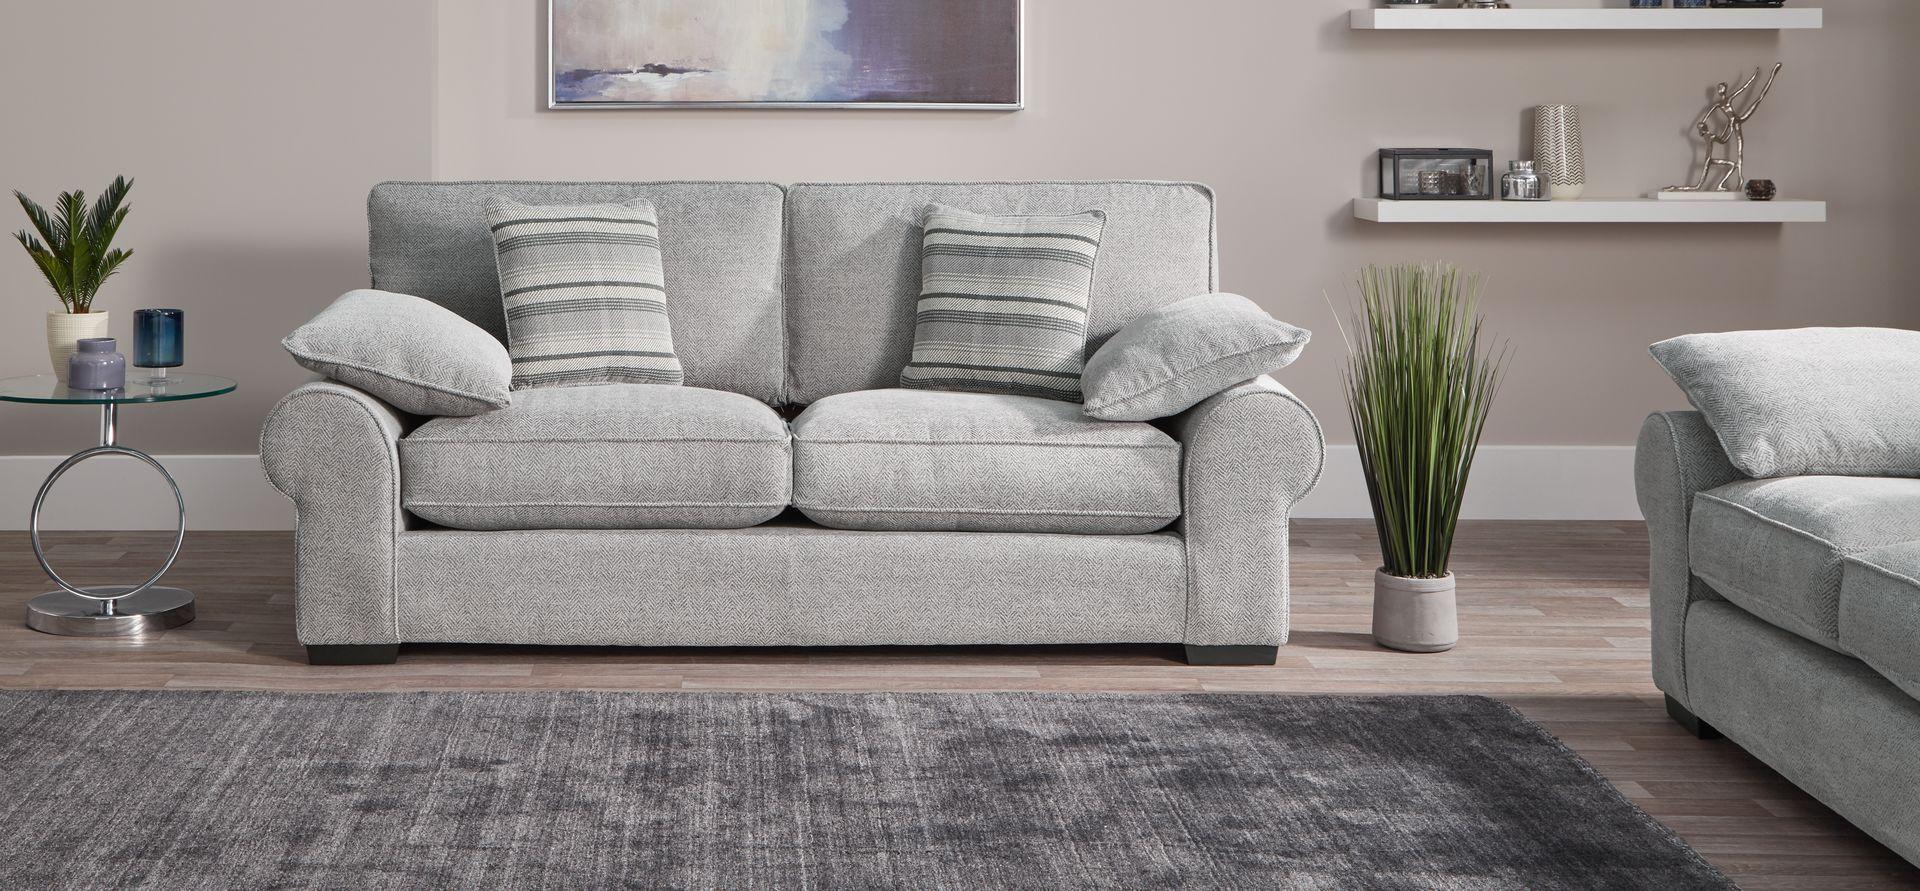 Ayda 3 Seater Sofa Standard Back Scs 3 Seater Sofa Living